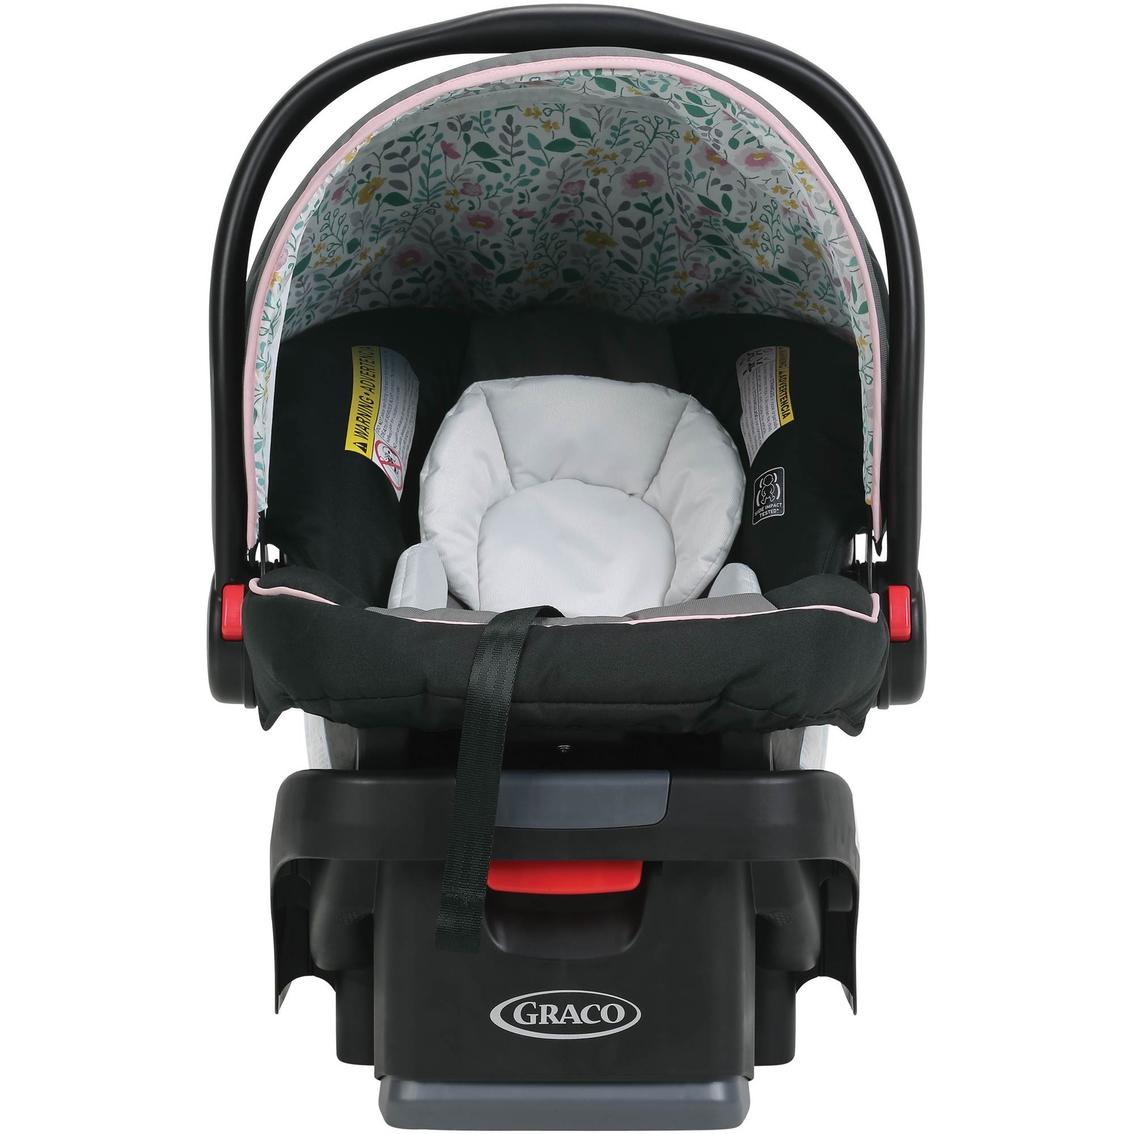 d204f44f6 Graco Snugride Snuglock 30 Infant Car Seat